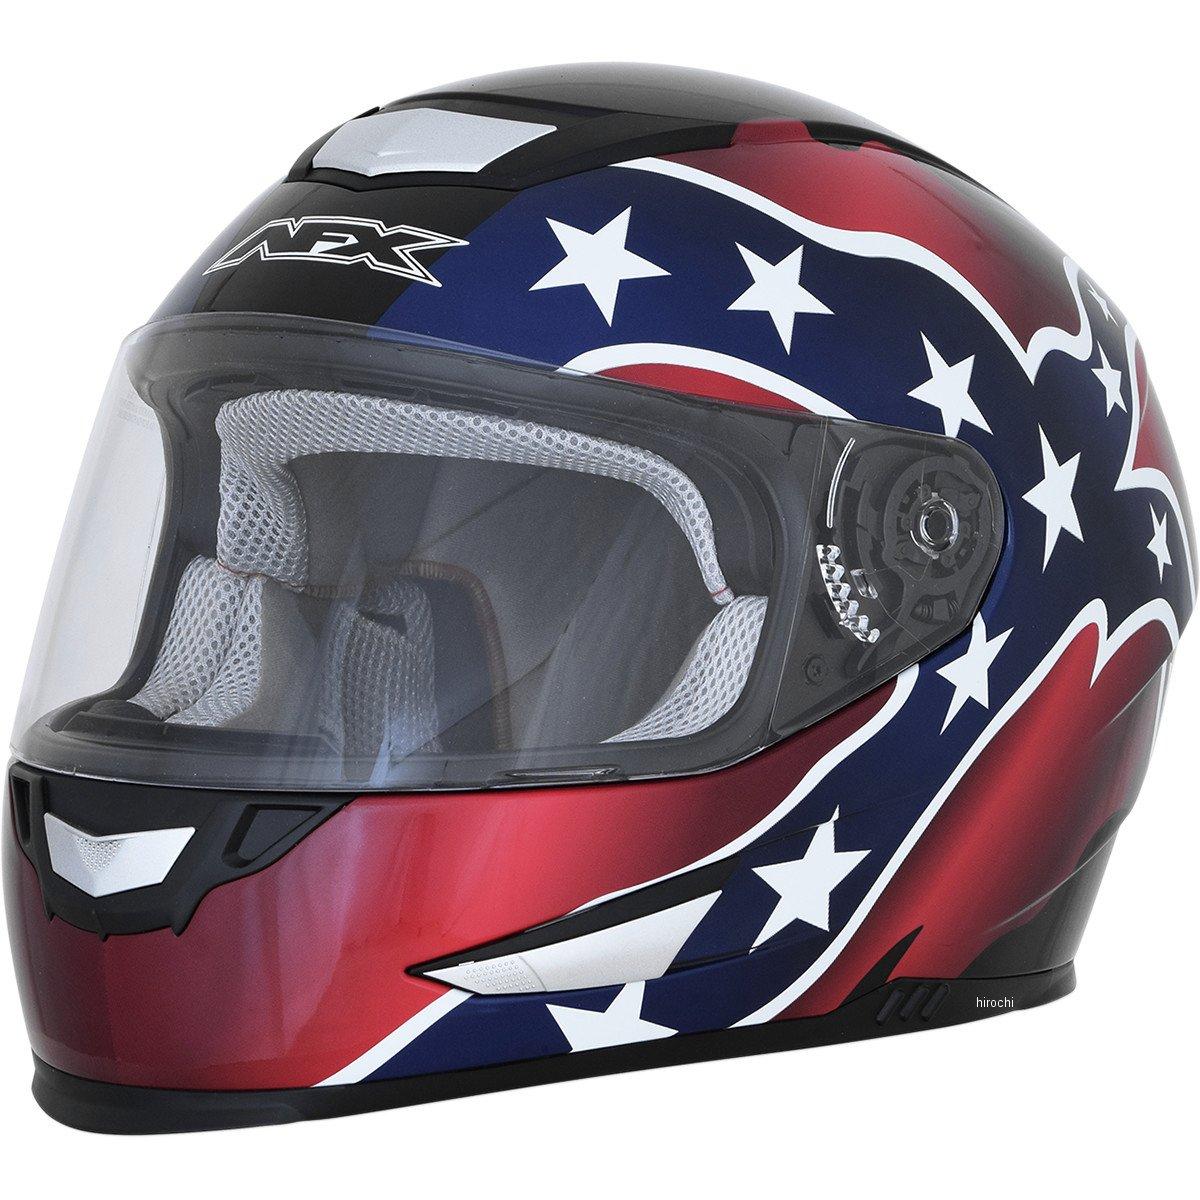 【USA在庫あり】 AFX フルフェイスヘルメット FX-99 黒レベル(つや有り) XLサイズ (61cm-62cm) 0101-11374 JP店